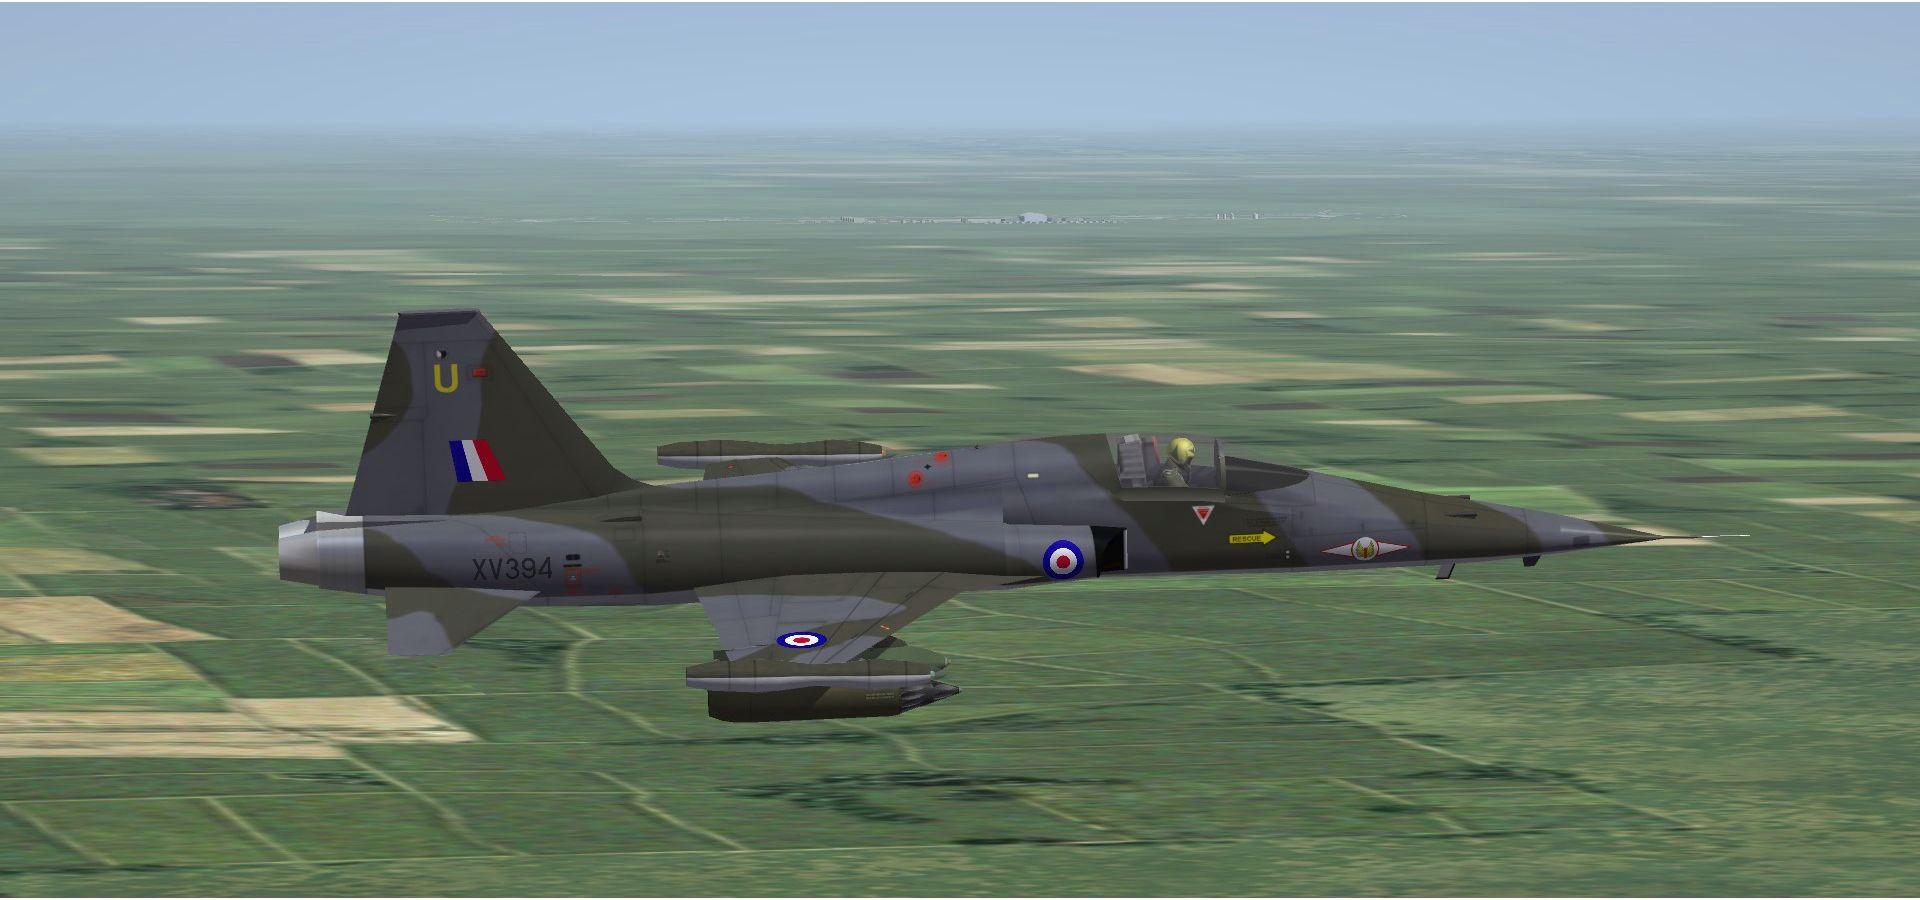 RAFF-5KFREEDOMFIGHTER03_zpsd0355b89.jpg